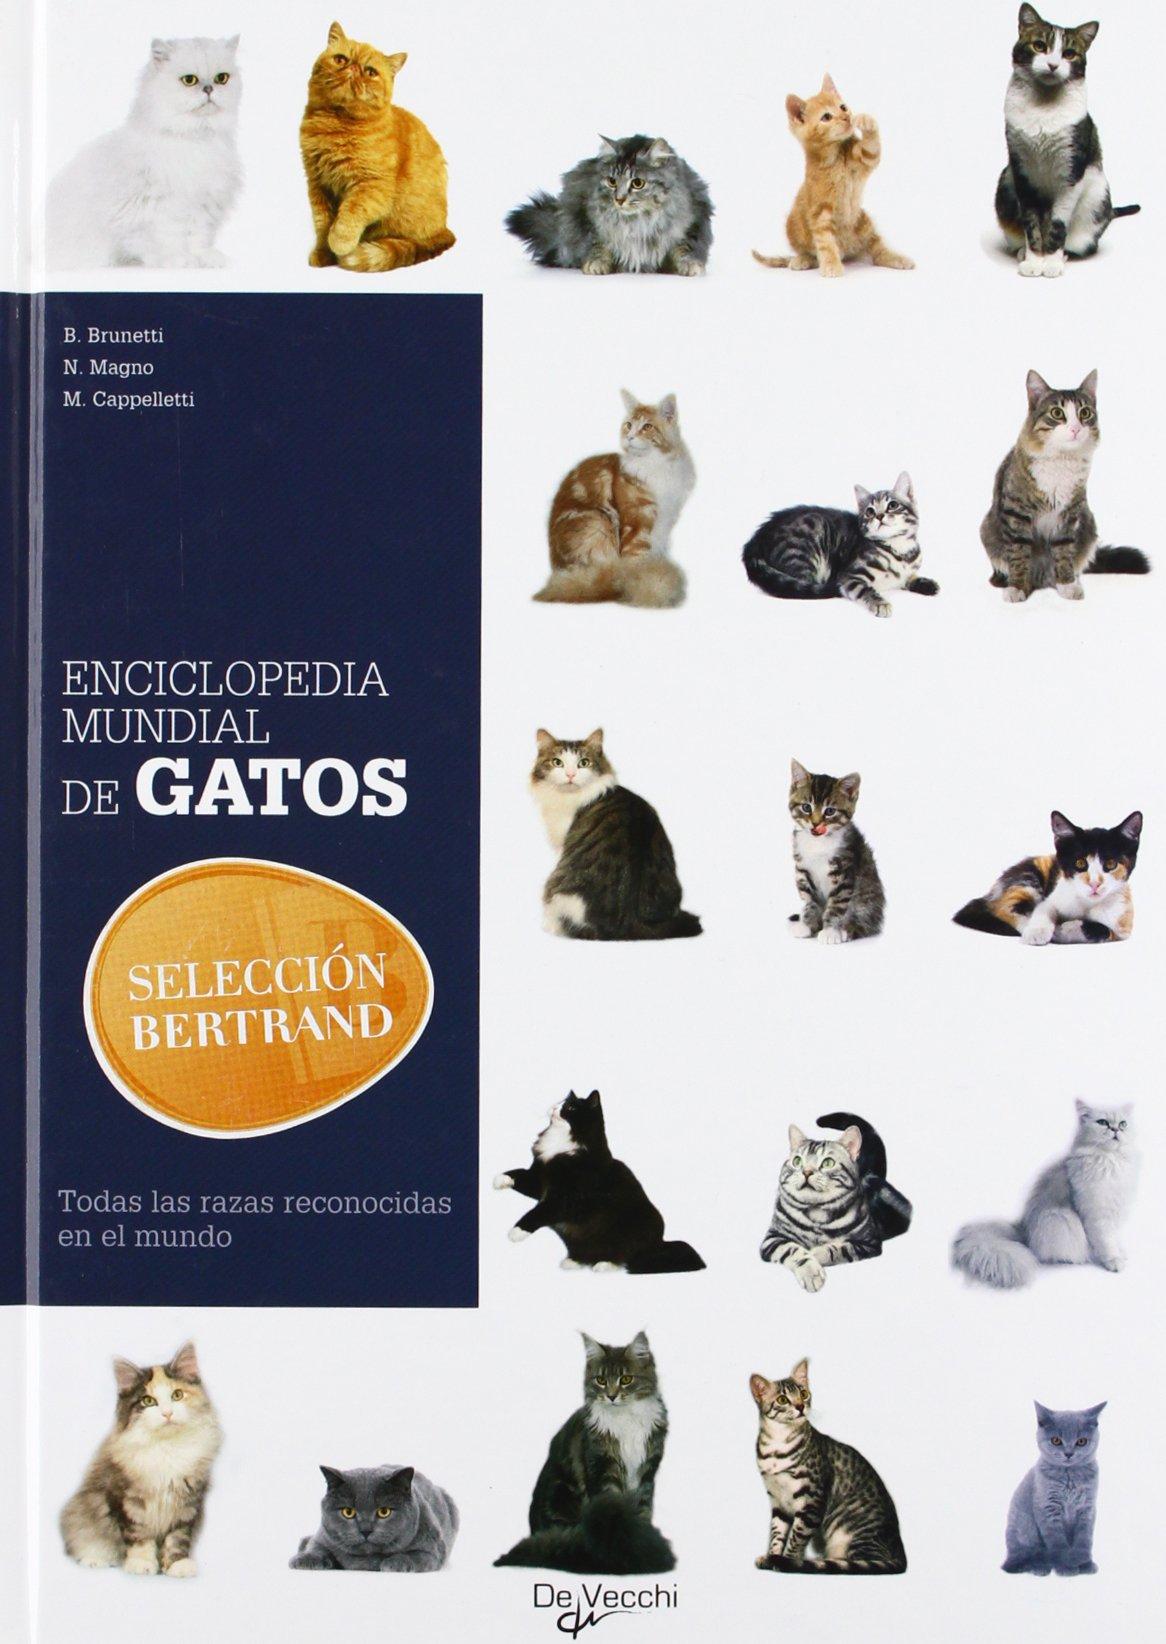 Enciclopedia mundial de gatos (Animales): Amazon.es: Brunetti, B ...